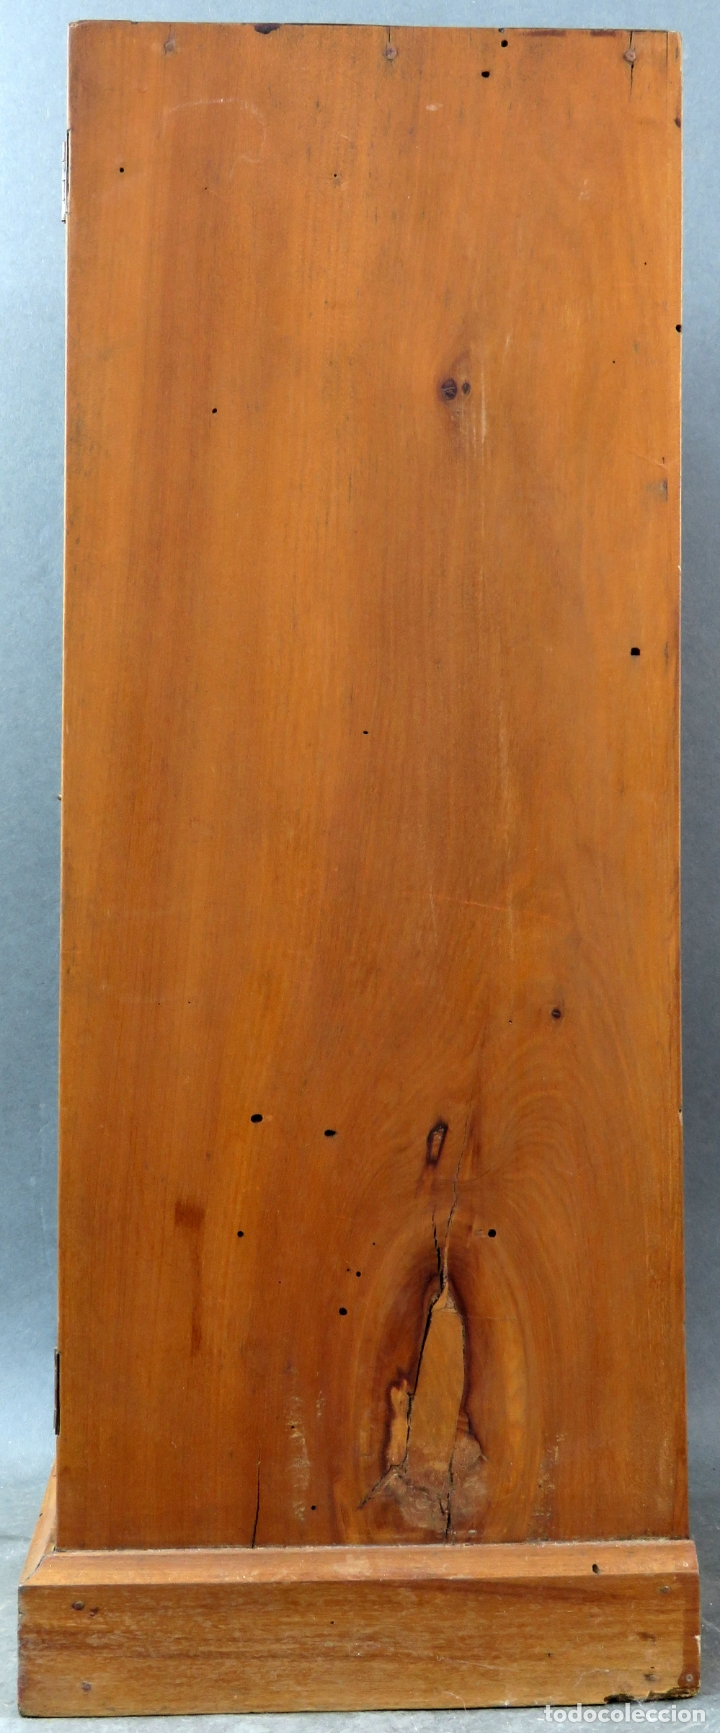 Arte: Capilla limosna visita domiciliaria Sagrada Familia en madera tallada policromada siglo XX - Foto 13 - 167120676